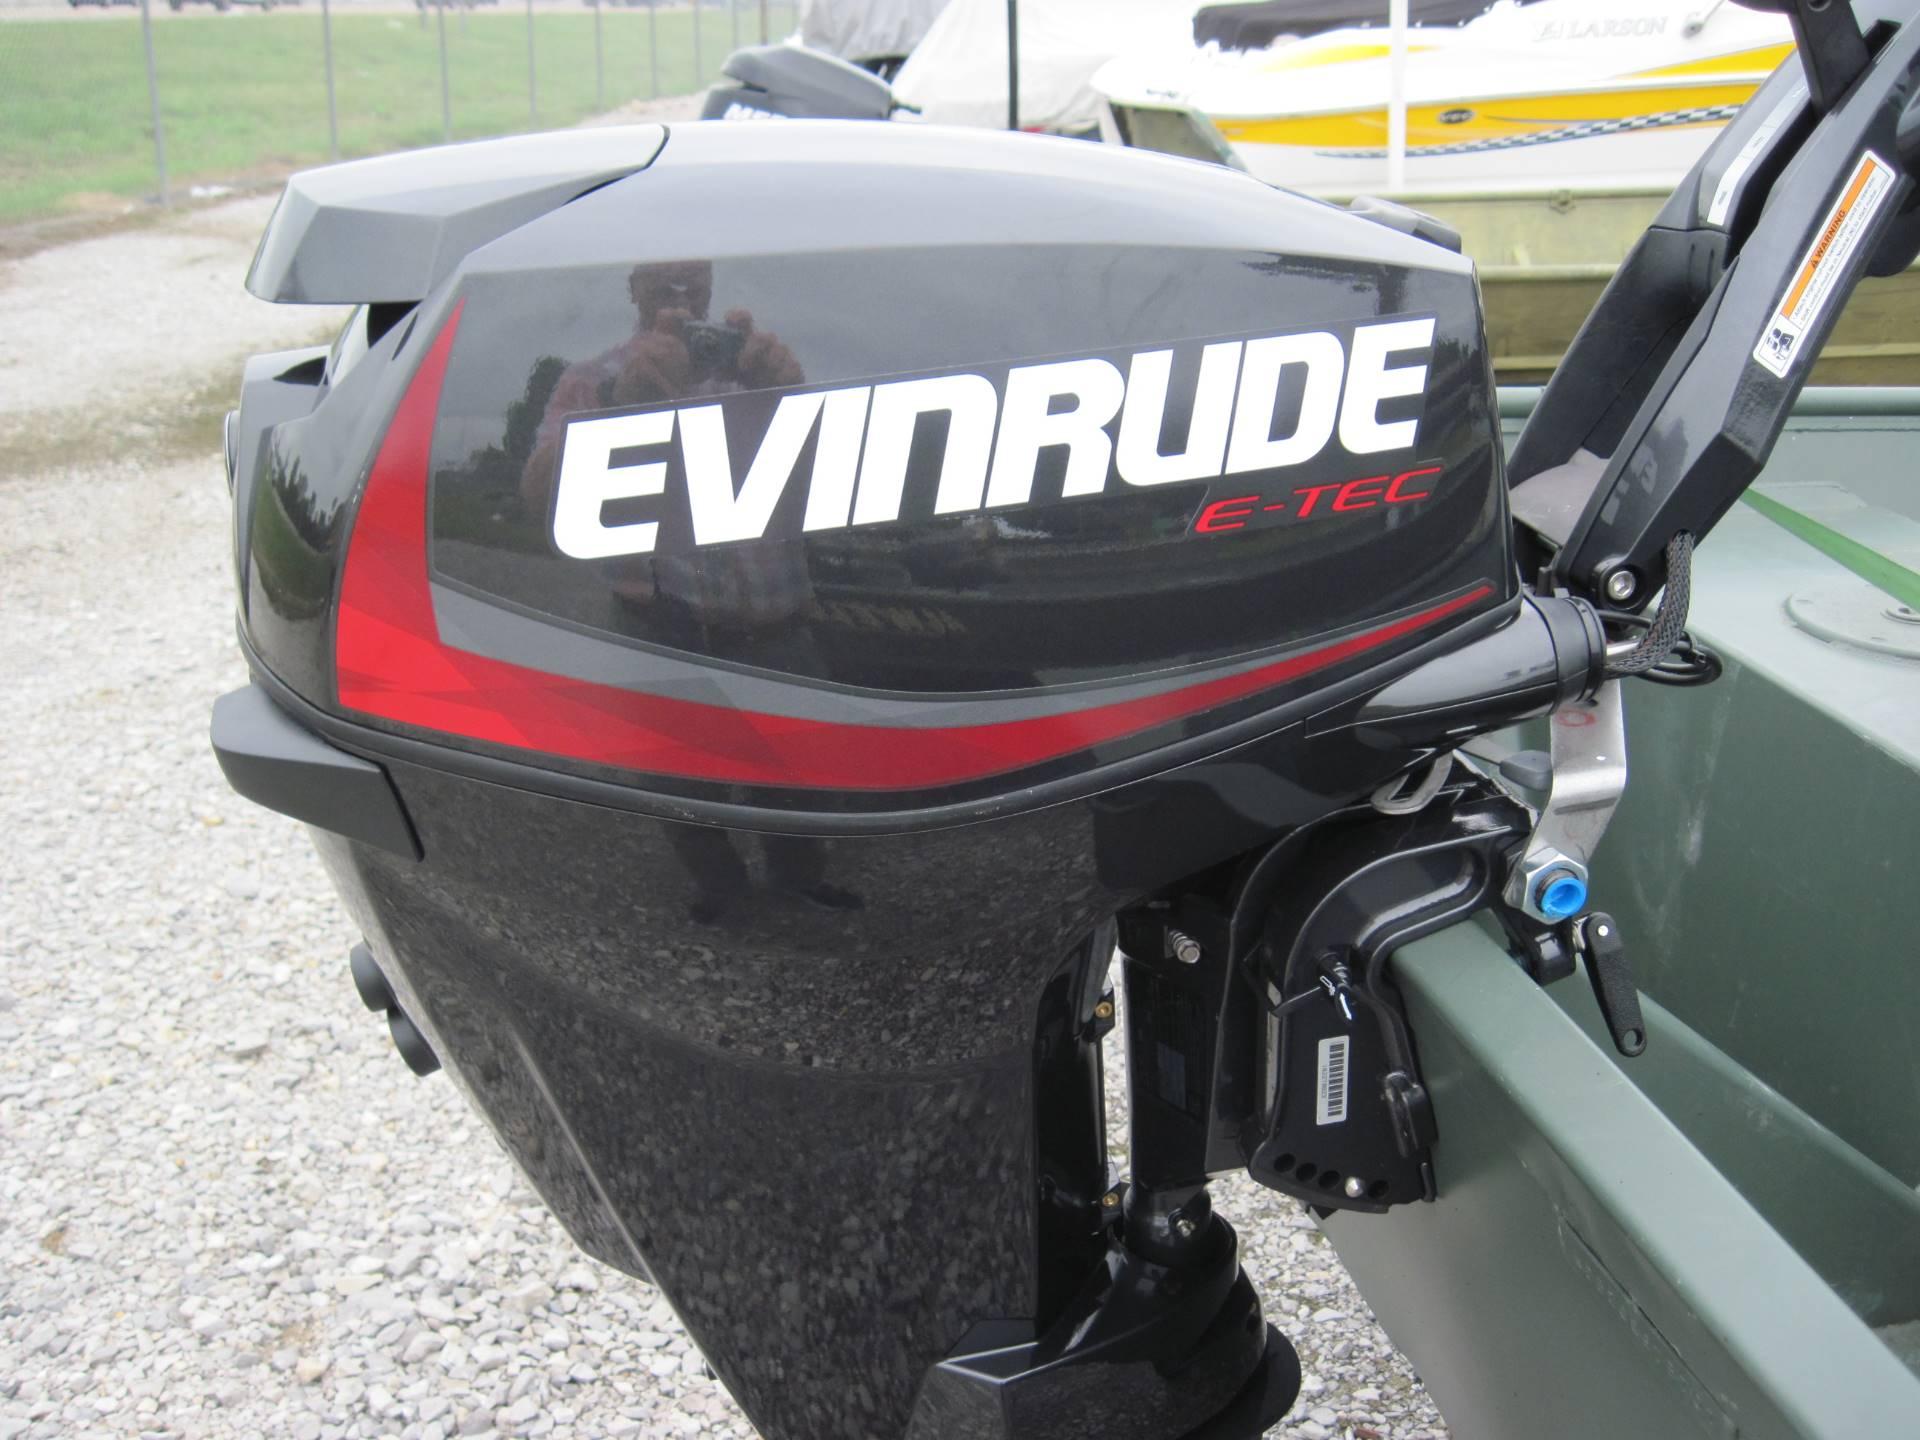 2019 Evinrude E Tec 25 Hp E25gtel Boat Engines Memphis Tennessee